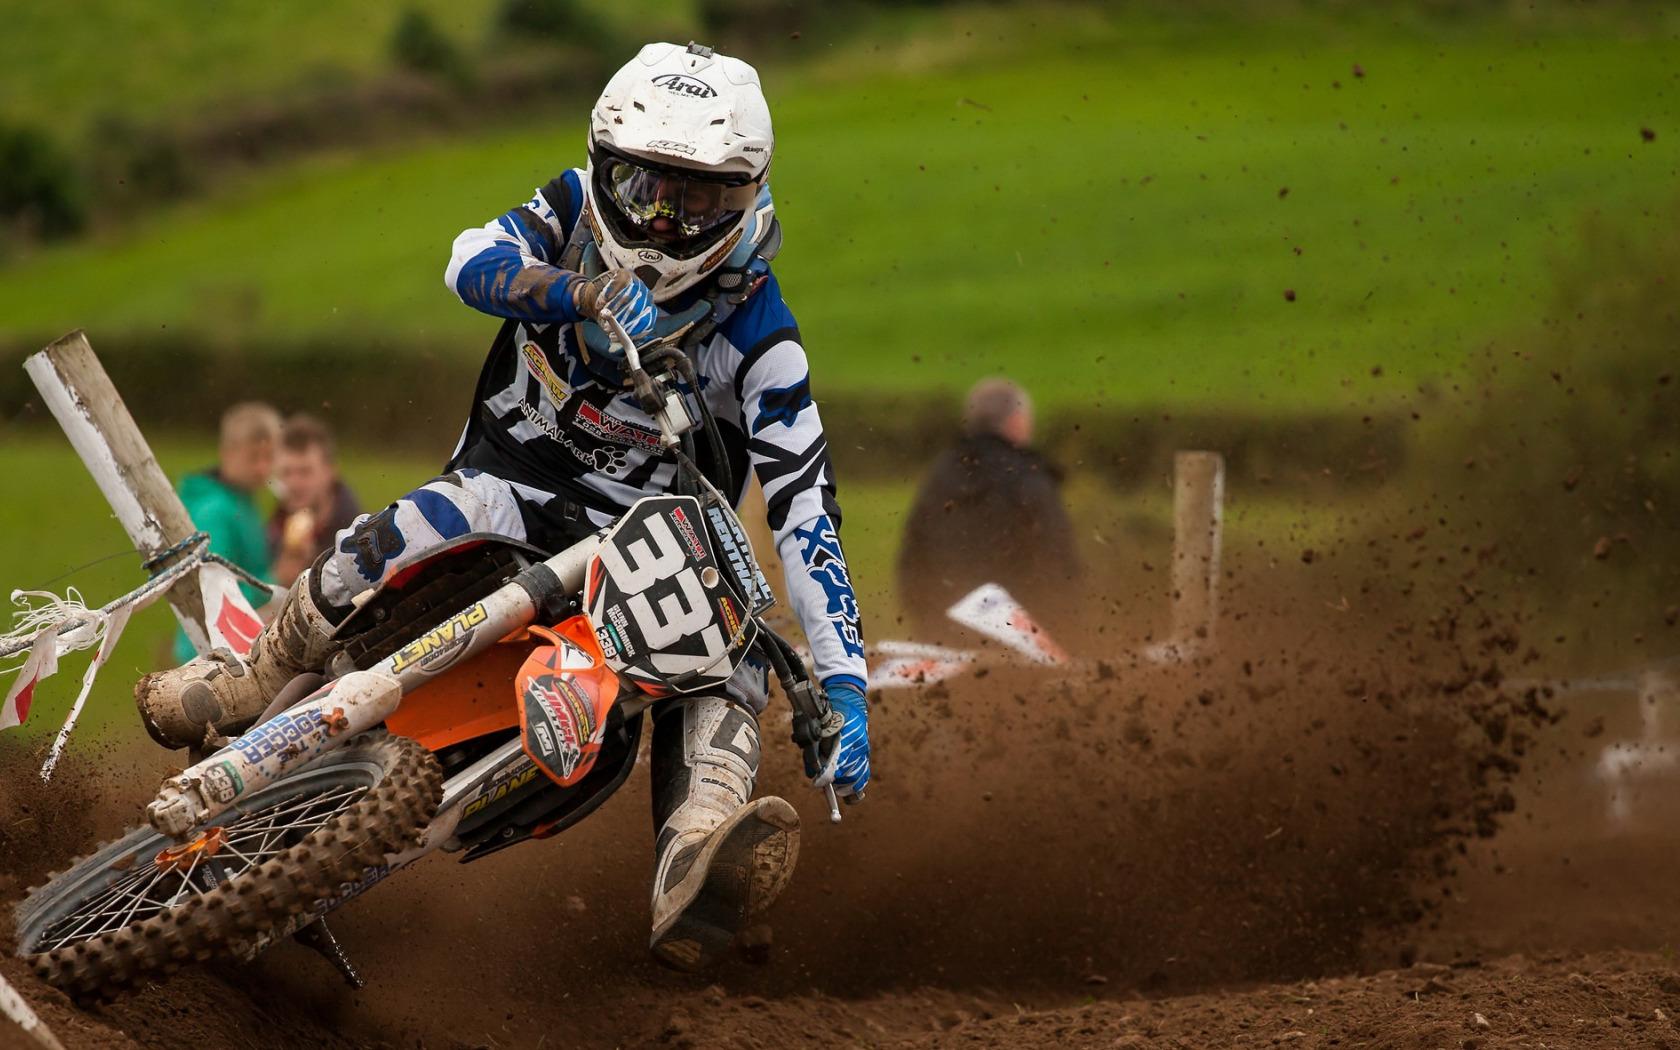 спорт мотоцикл гонка sports motorcycle race  № 3296477 загрузить